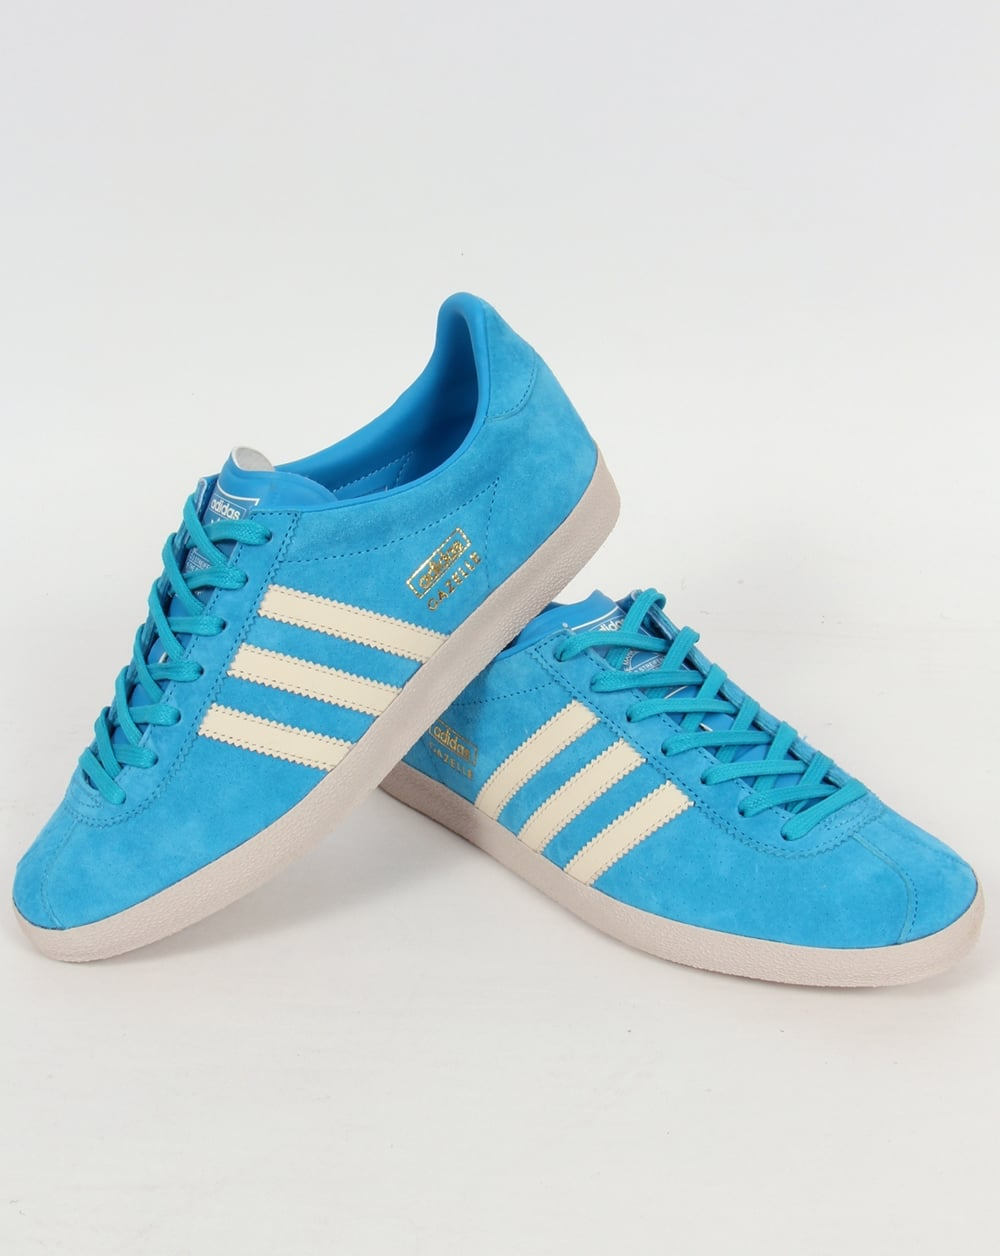 Mens Adidas Gazelle Og Trainers Blue